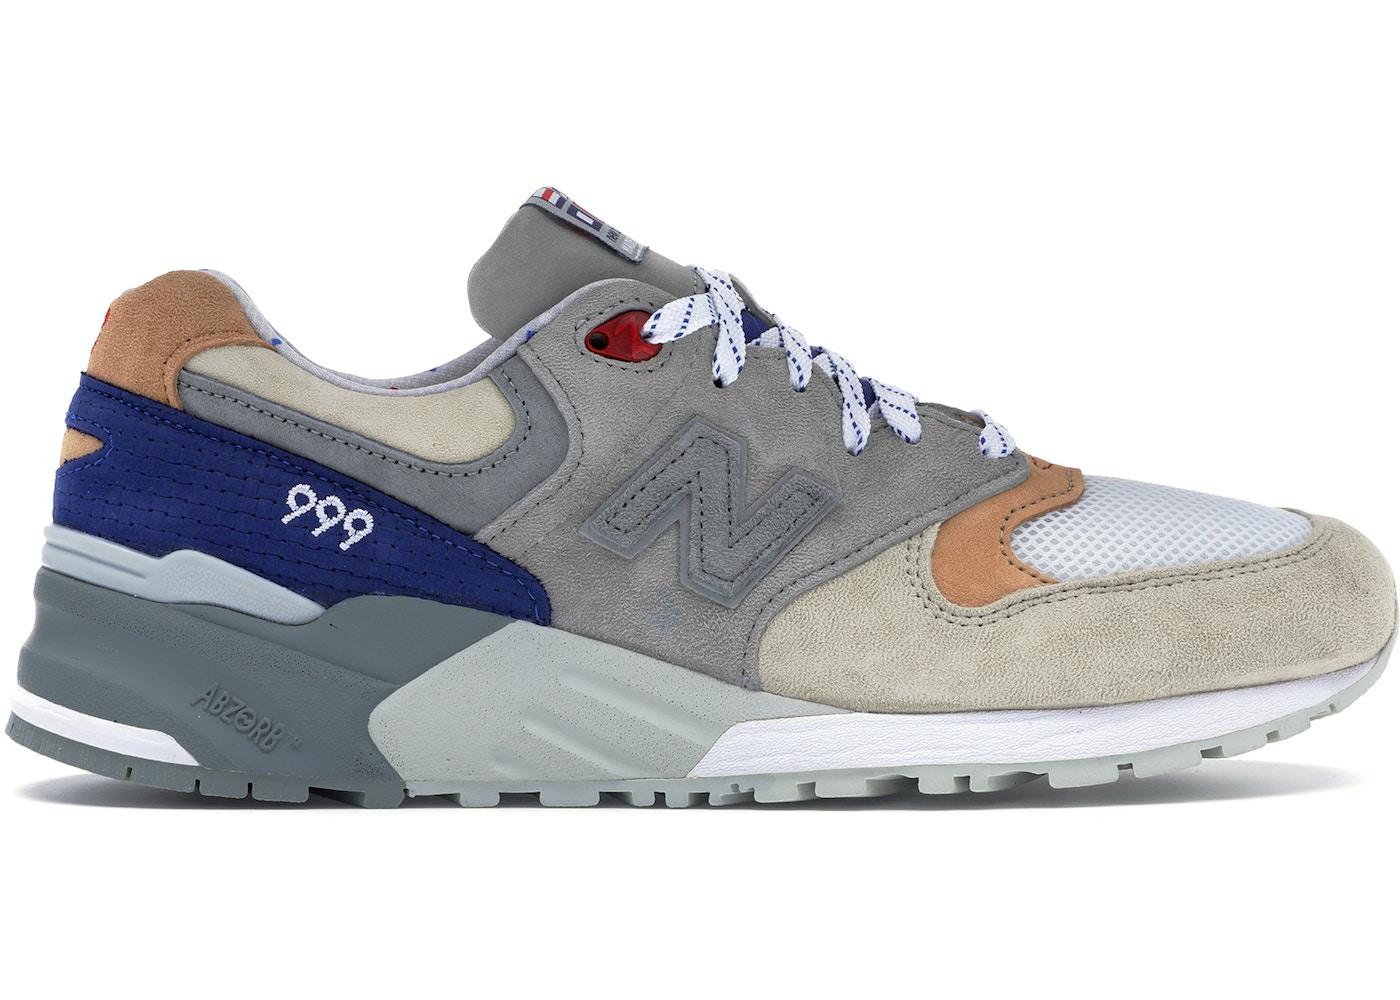 online retailer db00f 1422c New Balance 999 Concepts Hyannis (Blue)